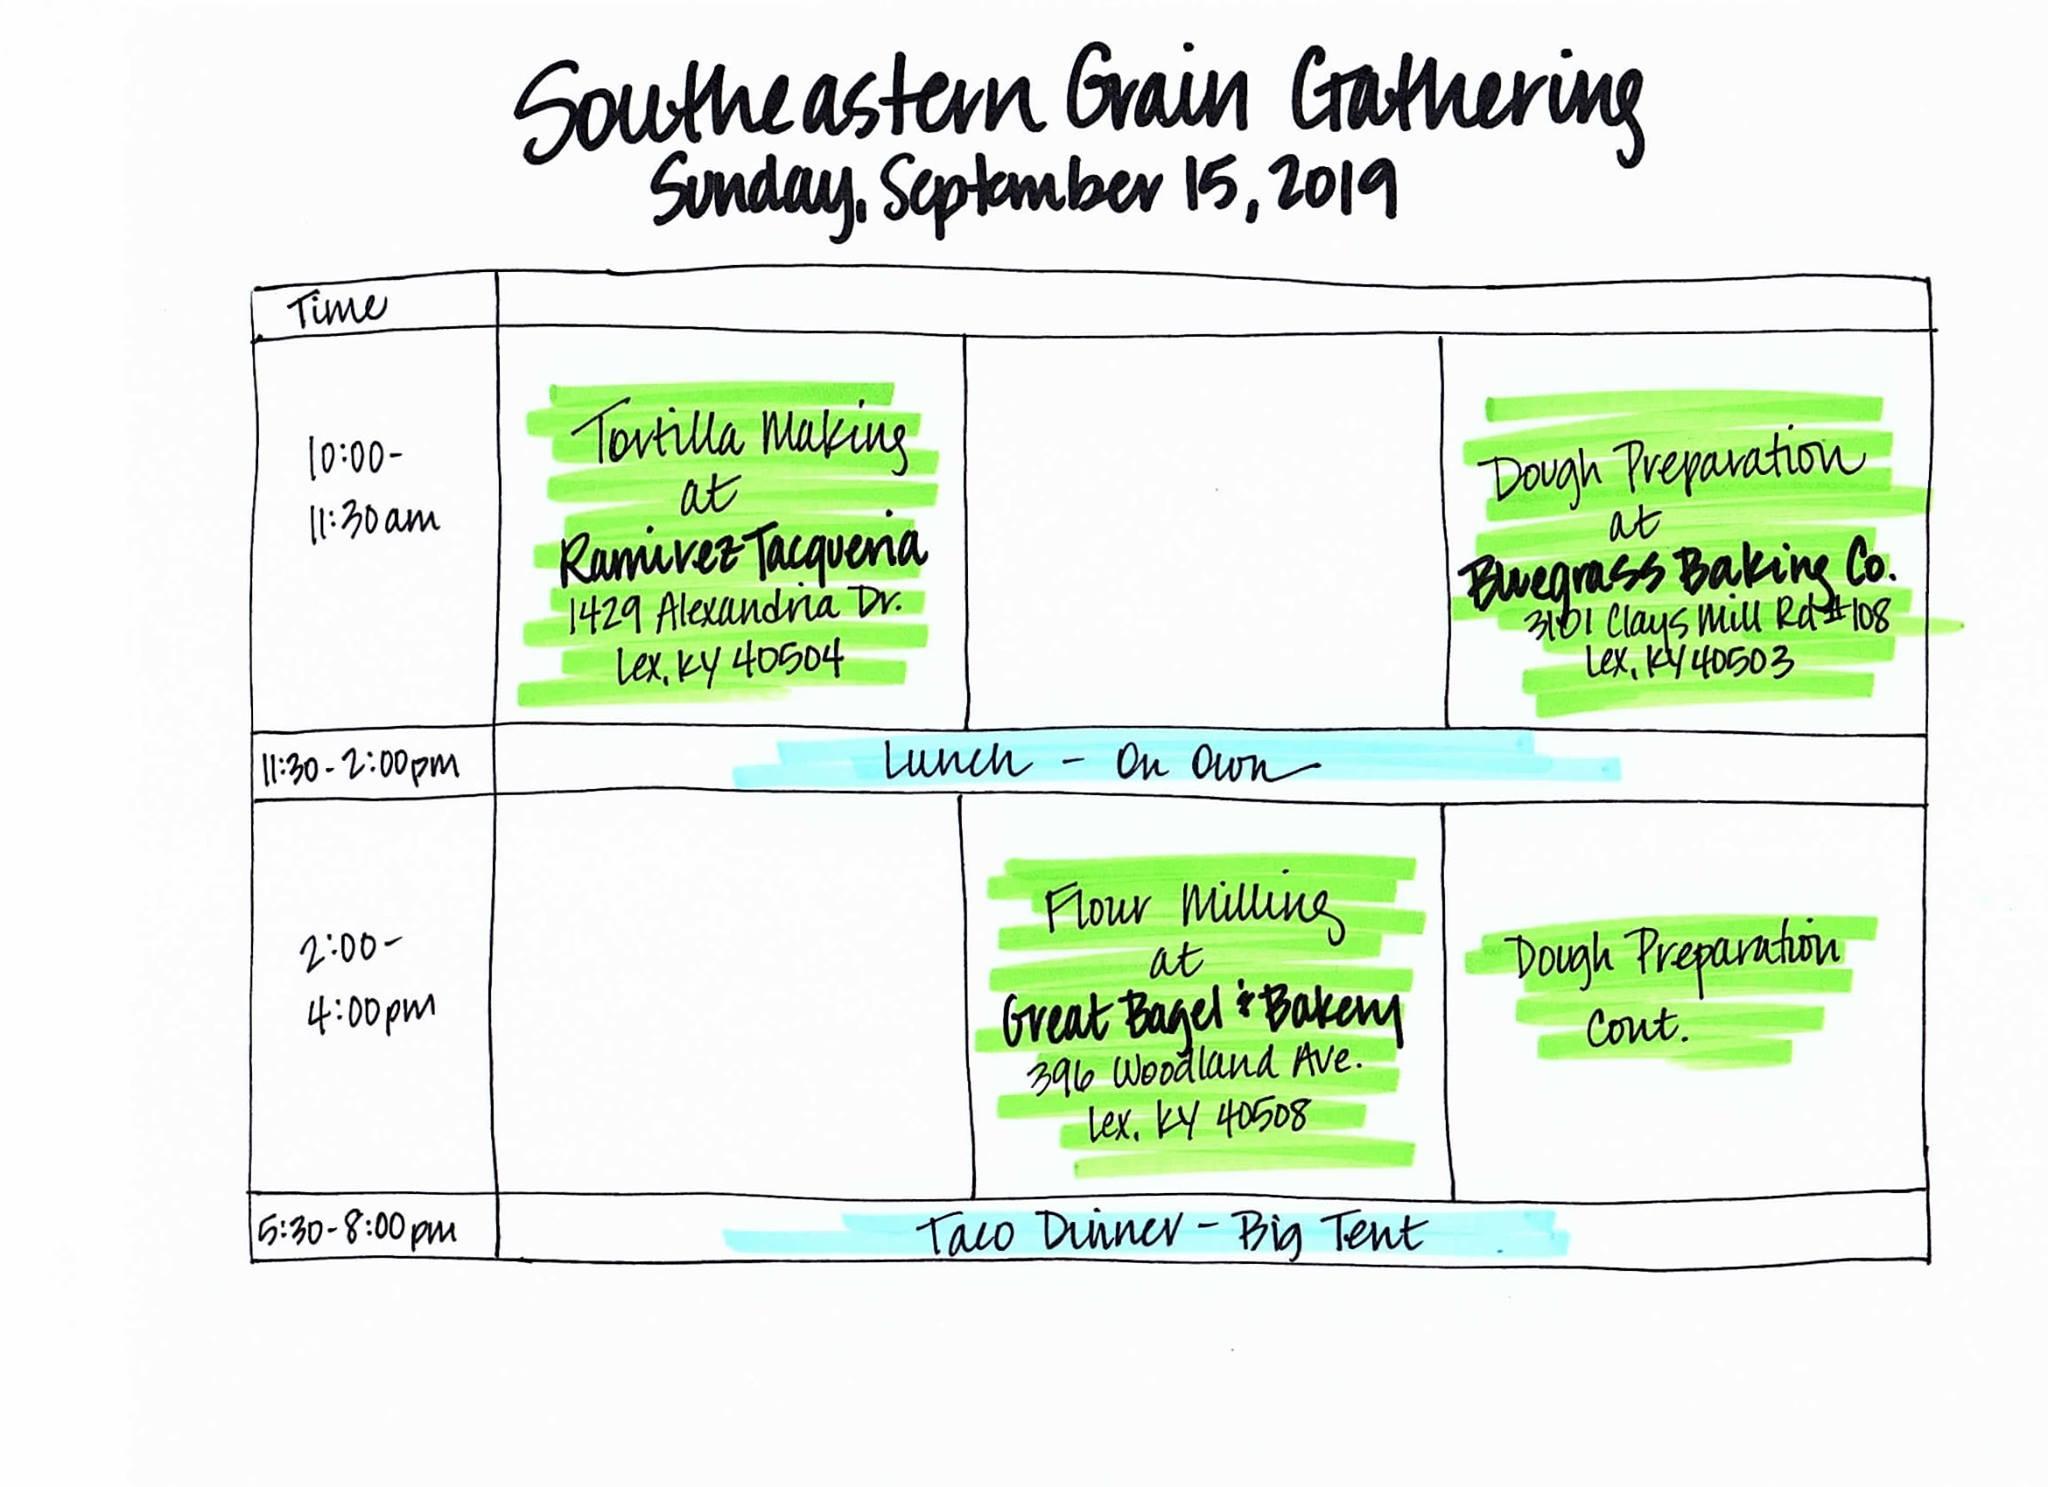 southeastern grain gathering schedule day 1.jpg